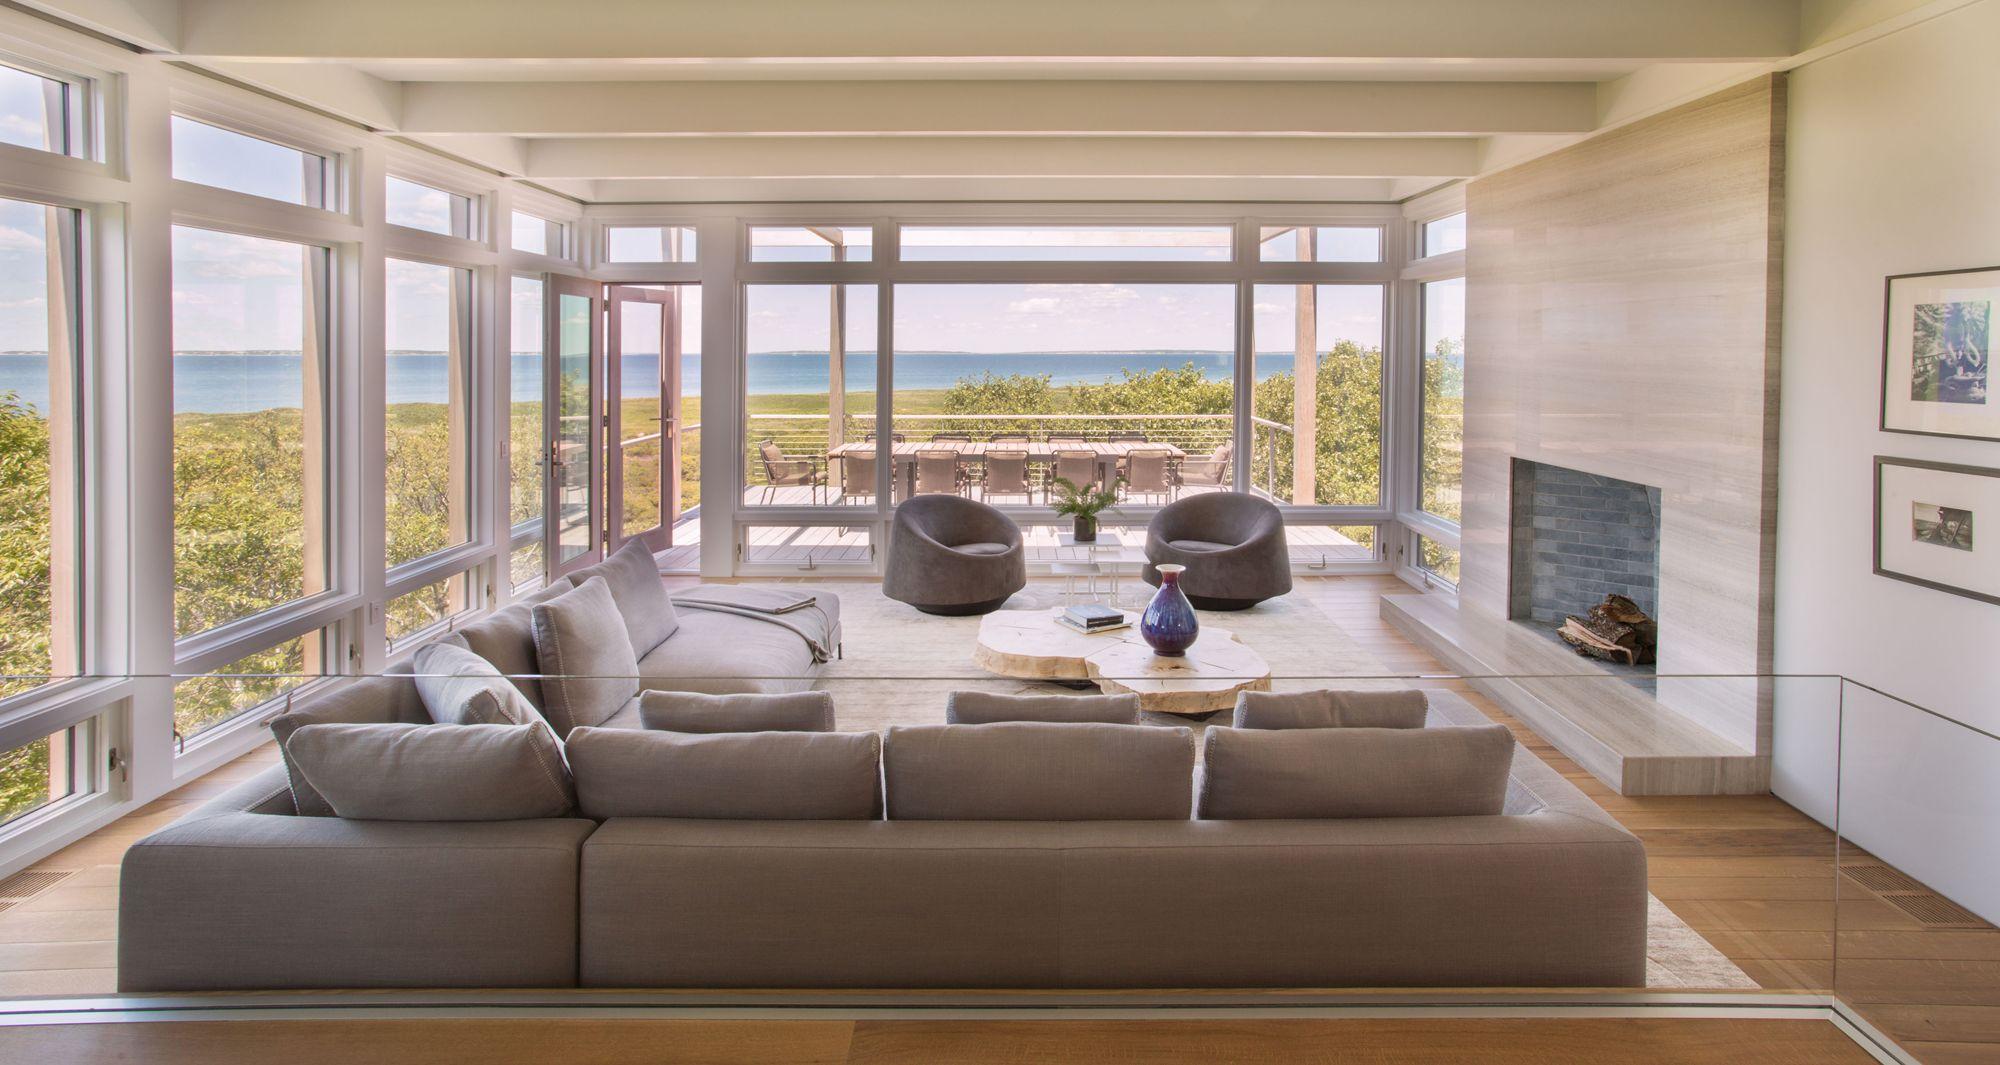 IIDA New England Design Award Winners 2017 Design awards Interior